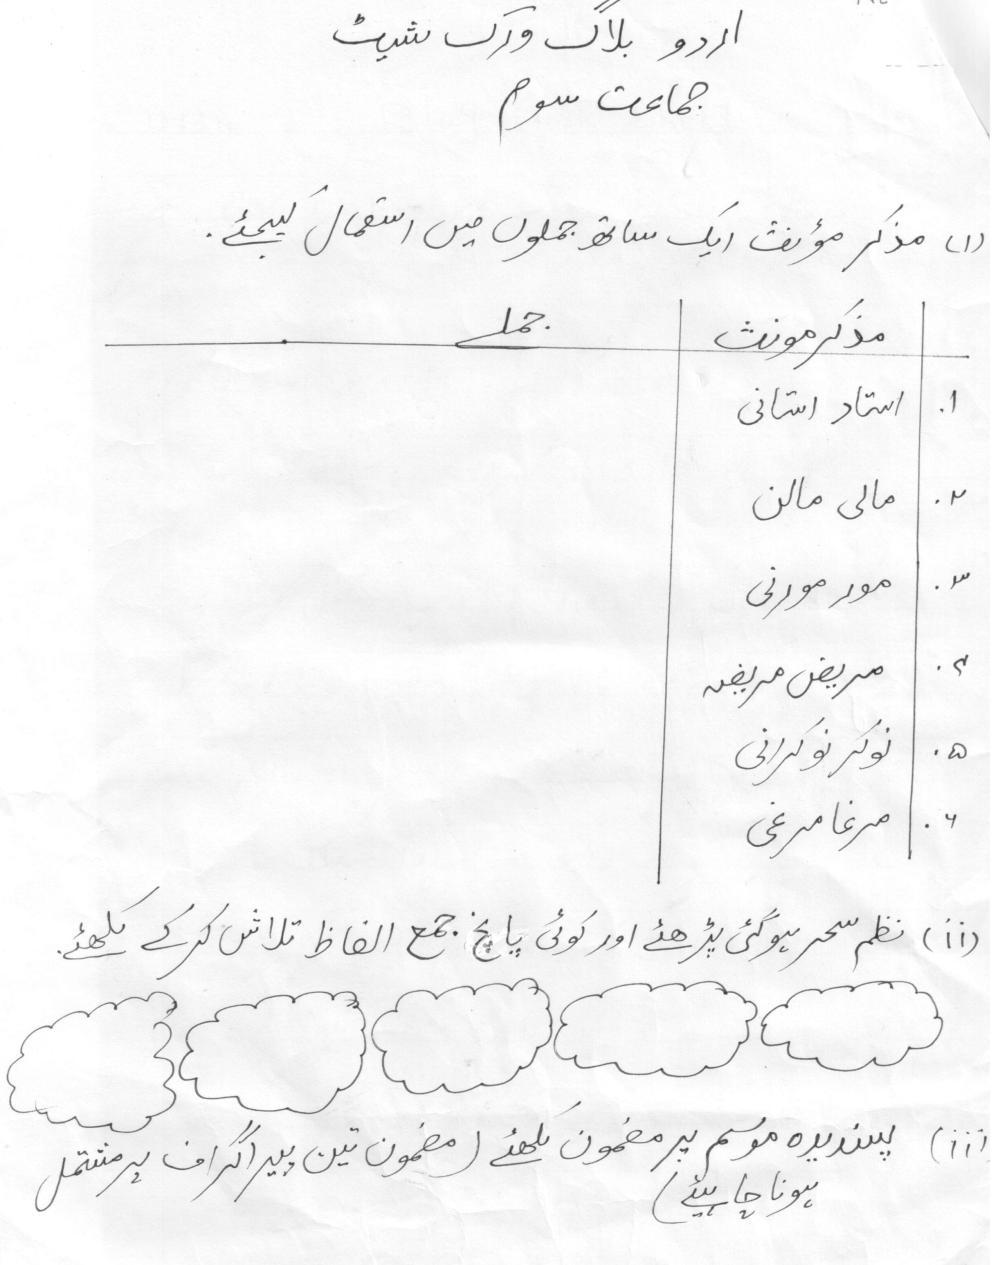 medium resolution of Urdu Worksheets For Montessori   Printable Worksheets and Activities for  Teachers